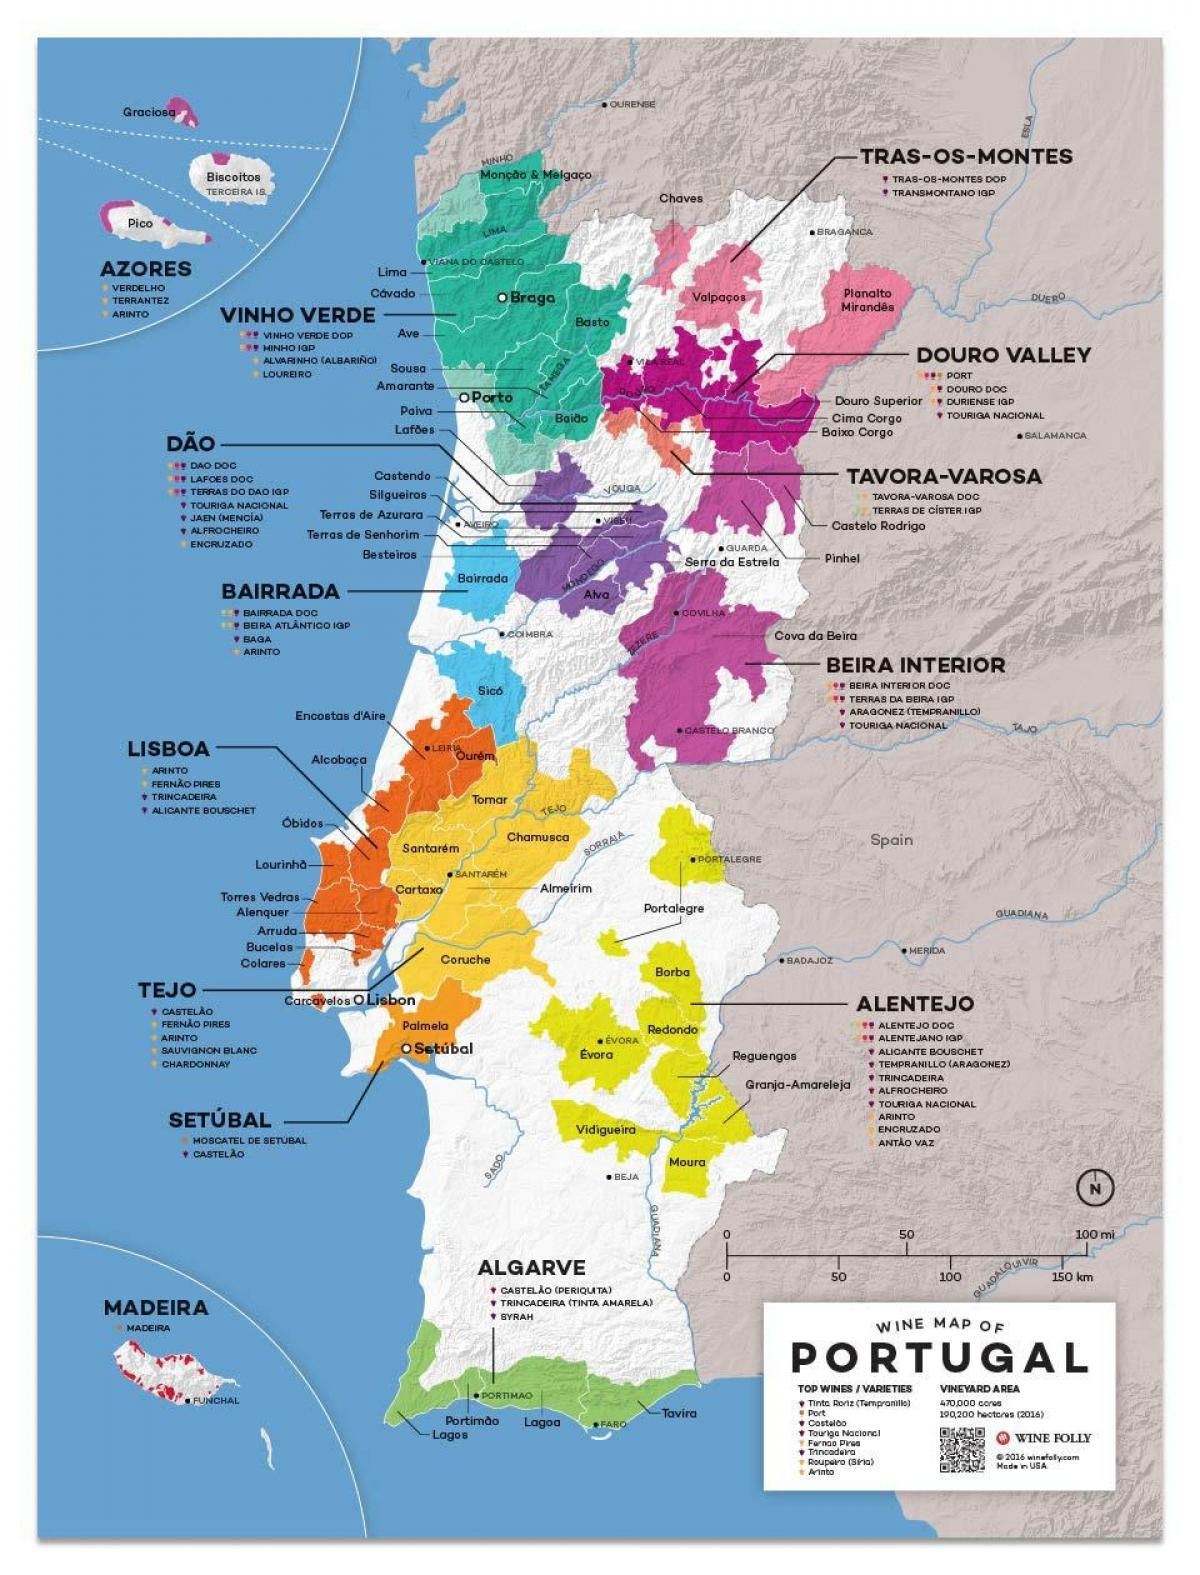 Karta Europa Portugal.Portugal Vin Karta Vin Karta I Portugal Som For Sodra Europa